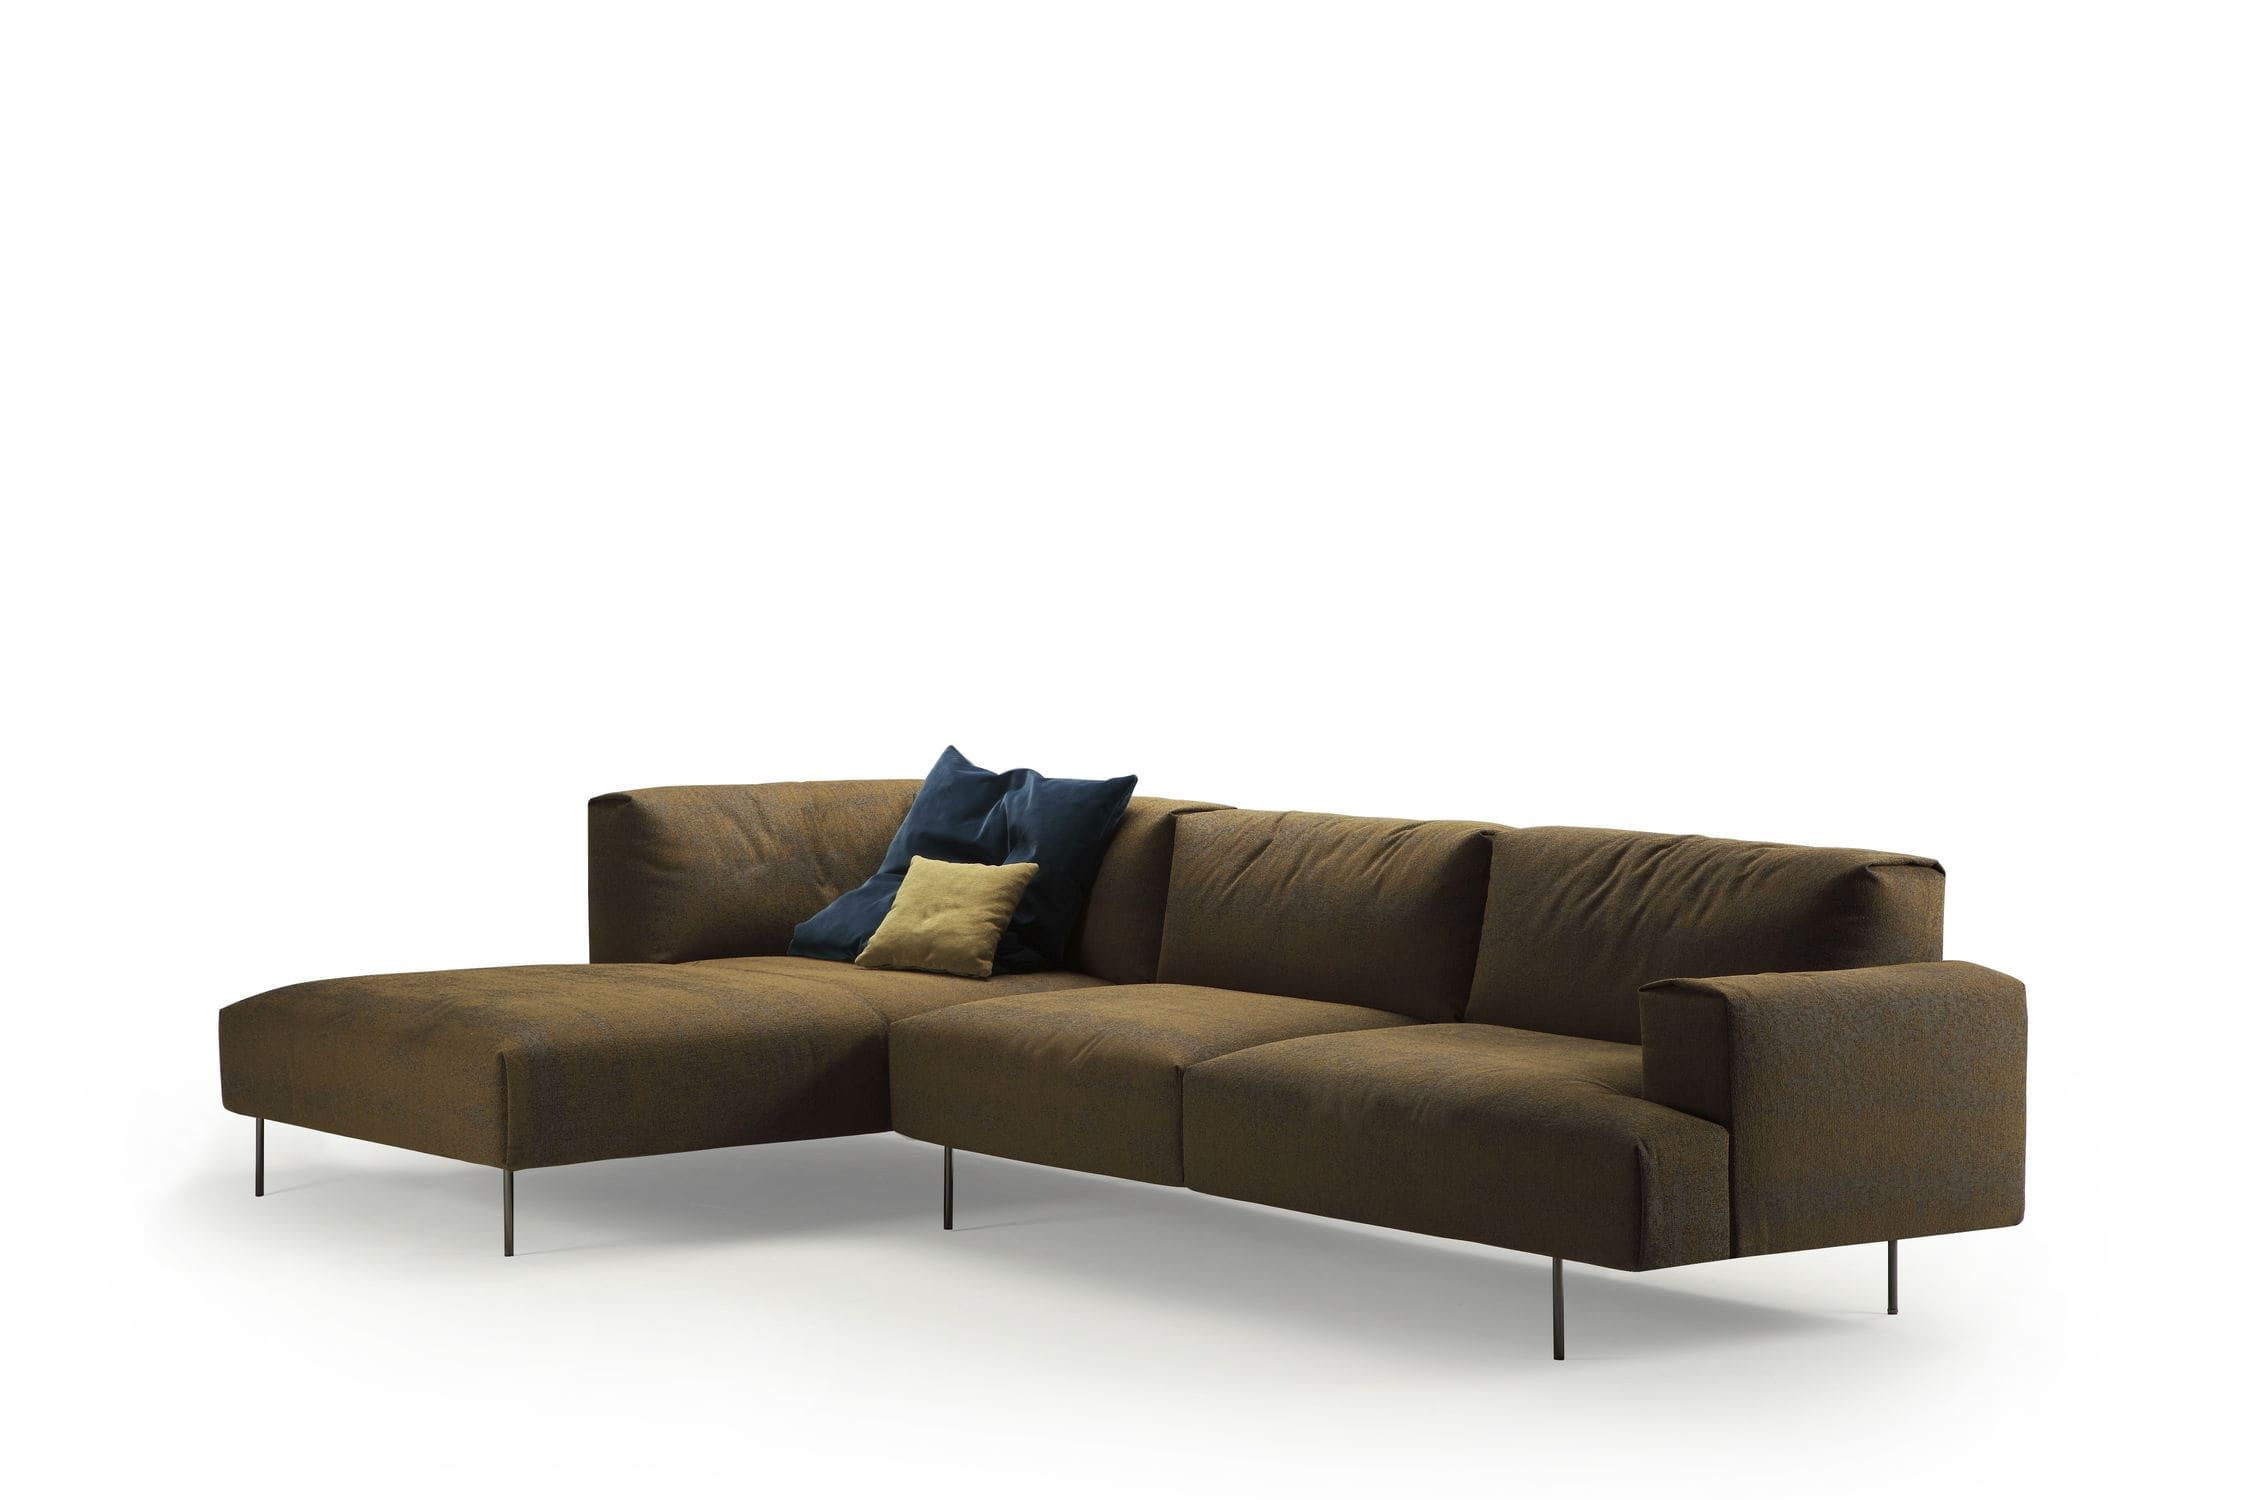 Modular Sofa Contemporary Fabric Tiptoe By Rafa Garcia Sancal